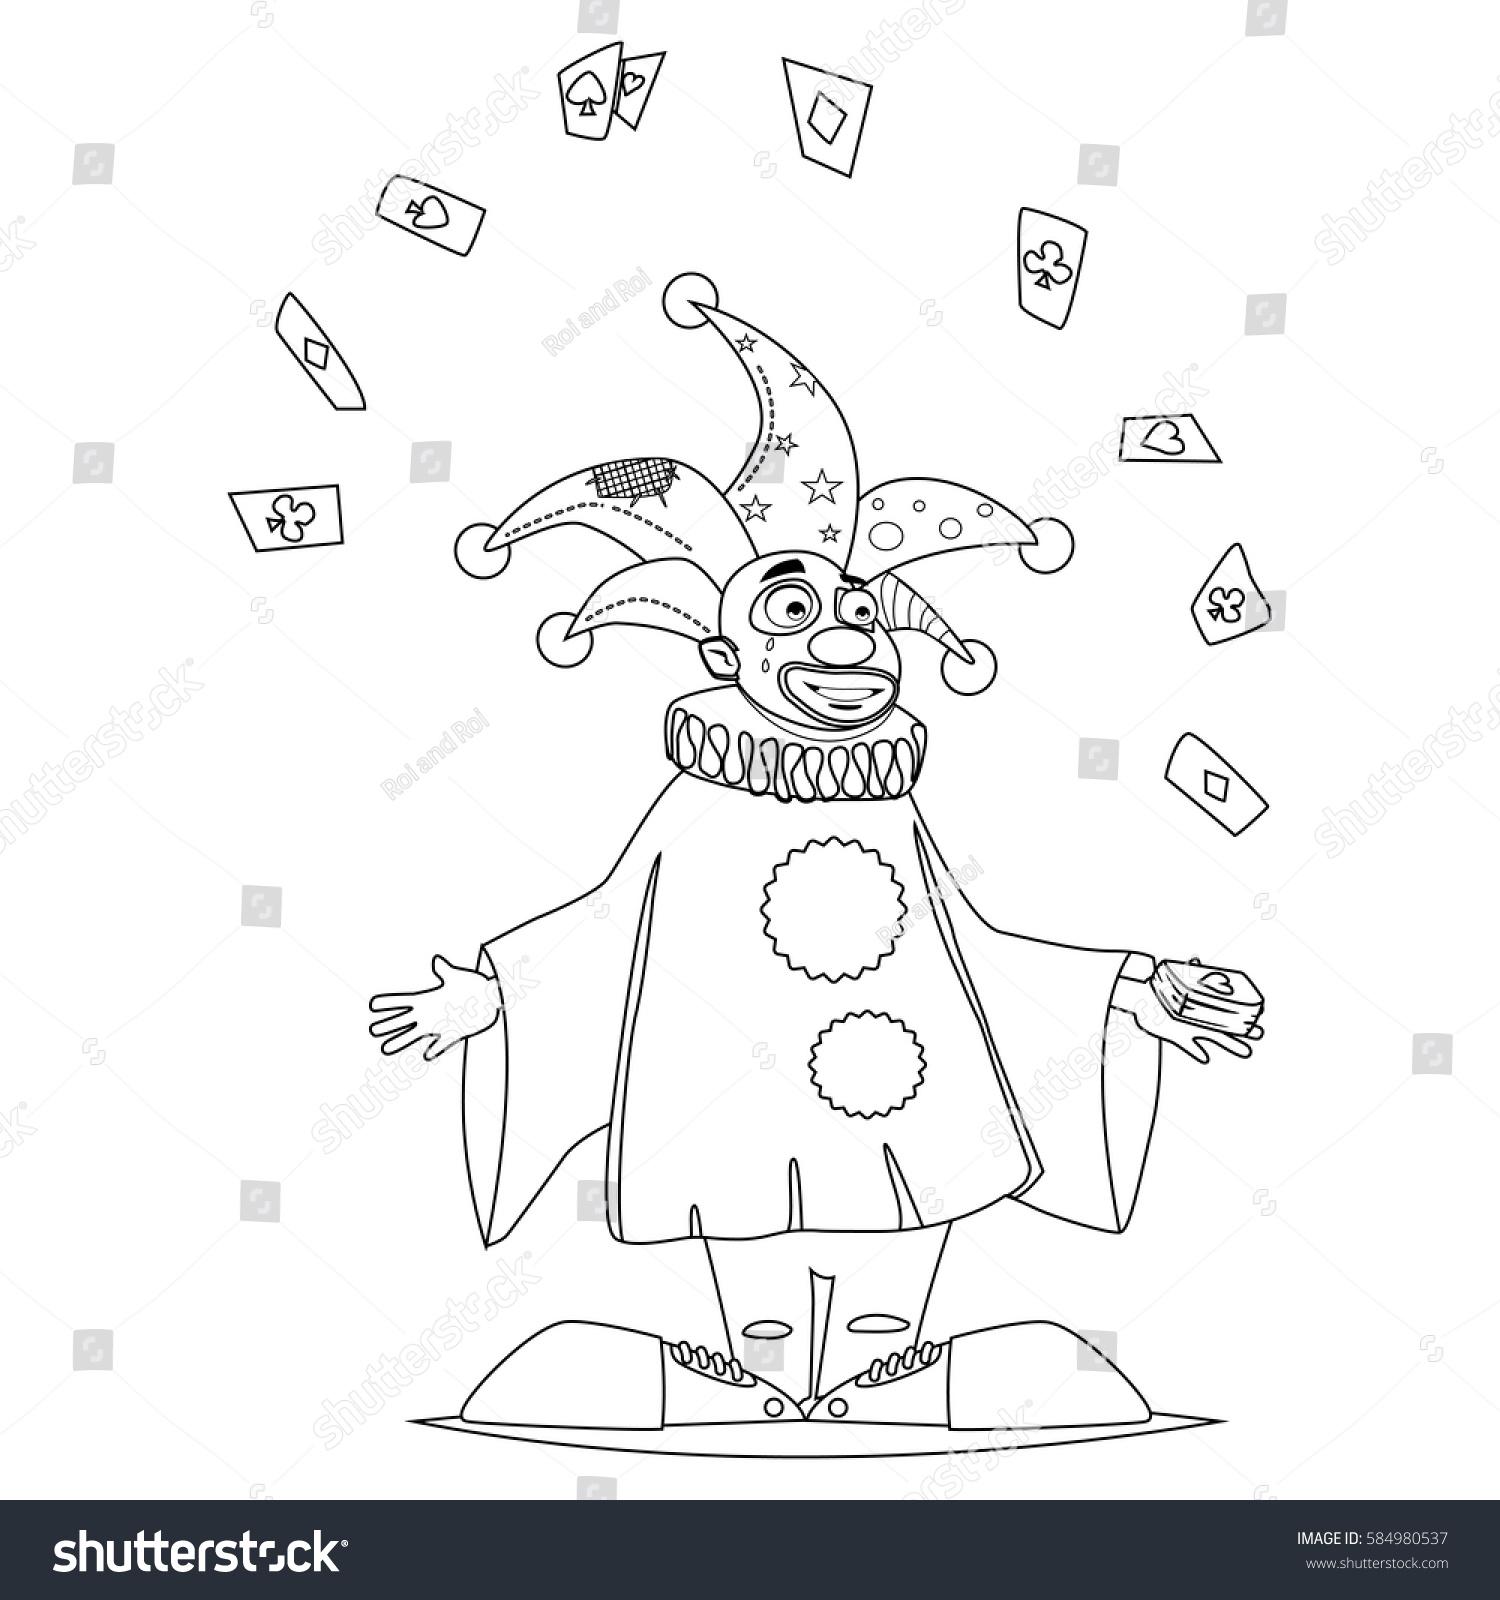 Coloring Book Page Circus Clown Juggles Stock Vector